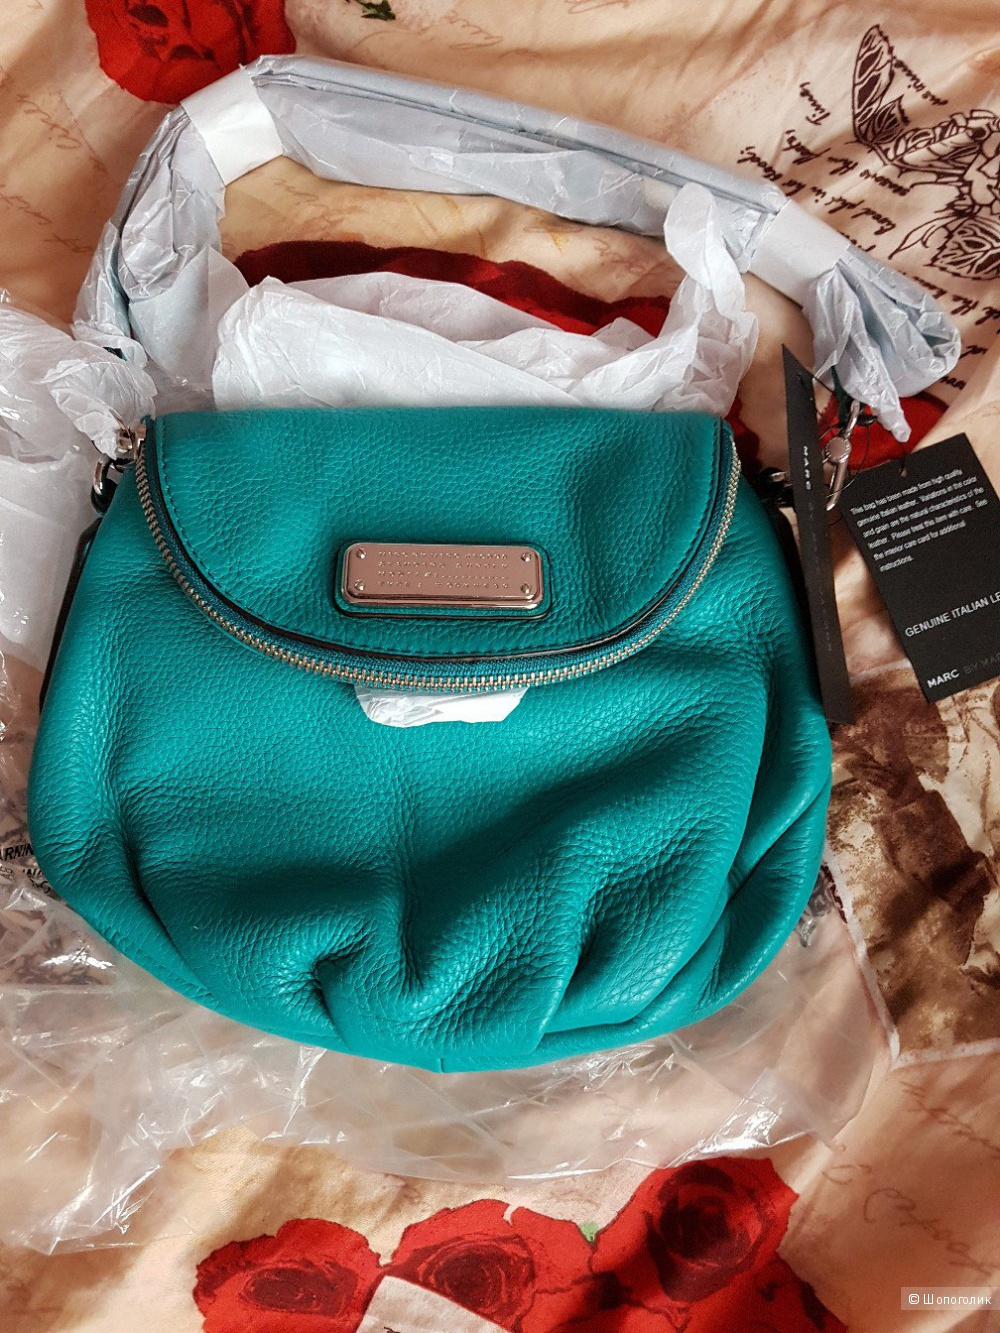 Новая кожаная сумка  Marc by Marc Jacobs Natasha Mini Leather Crossbody